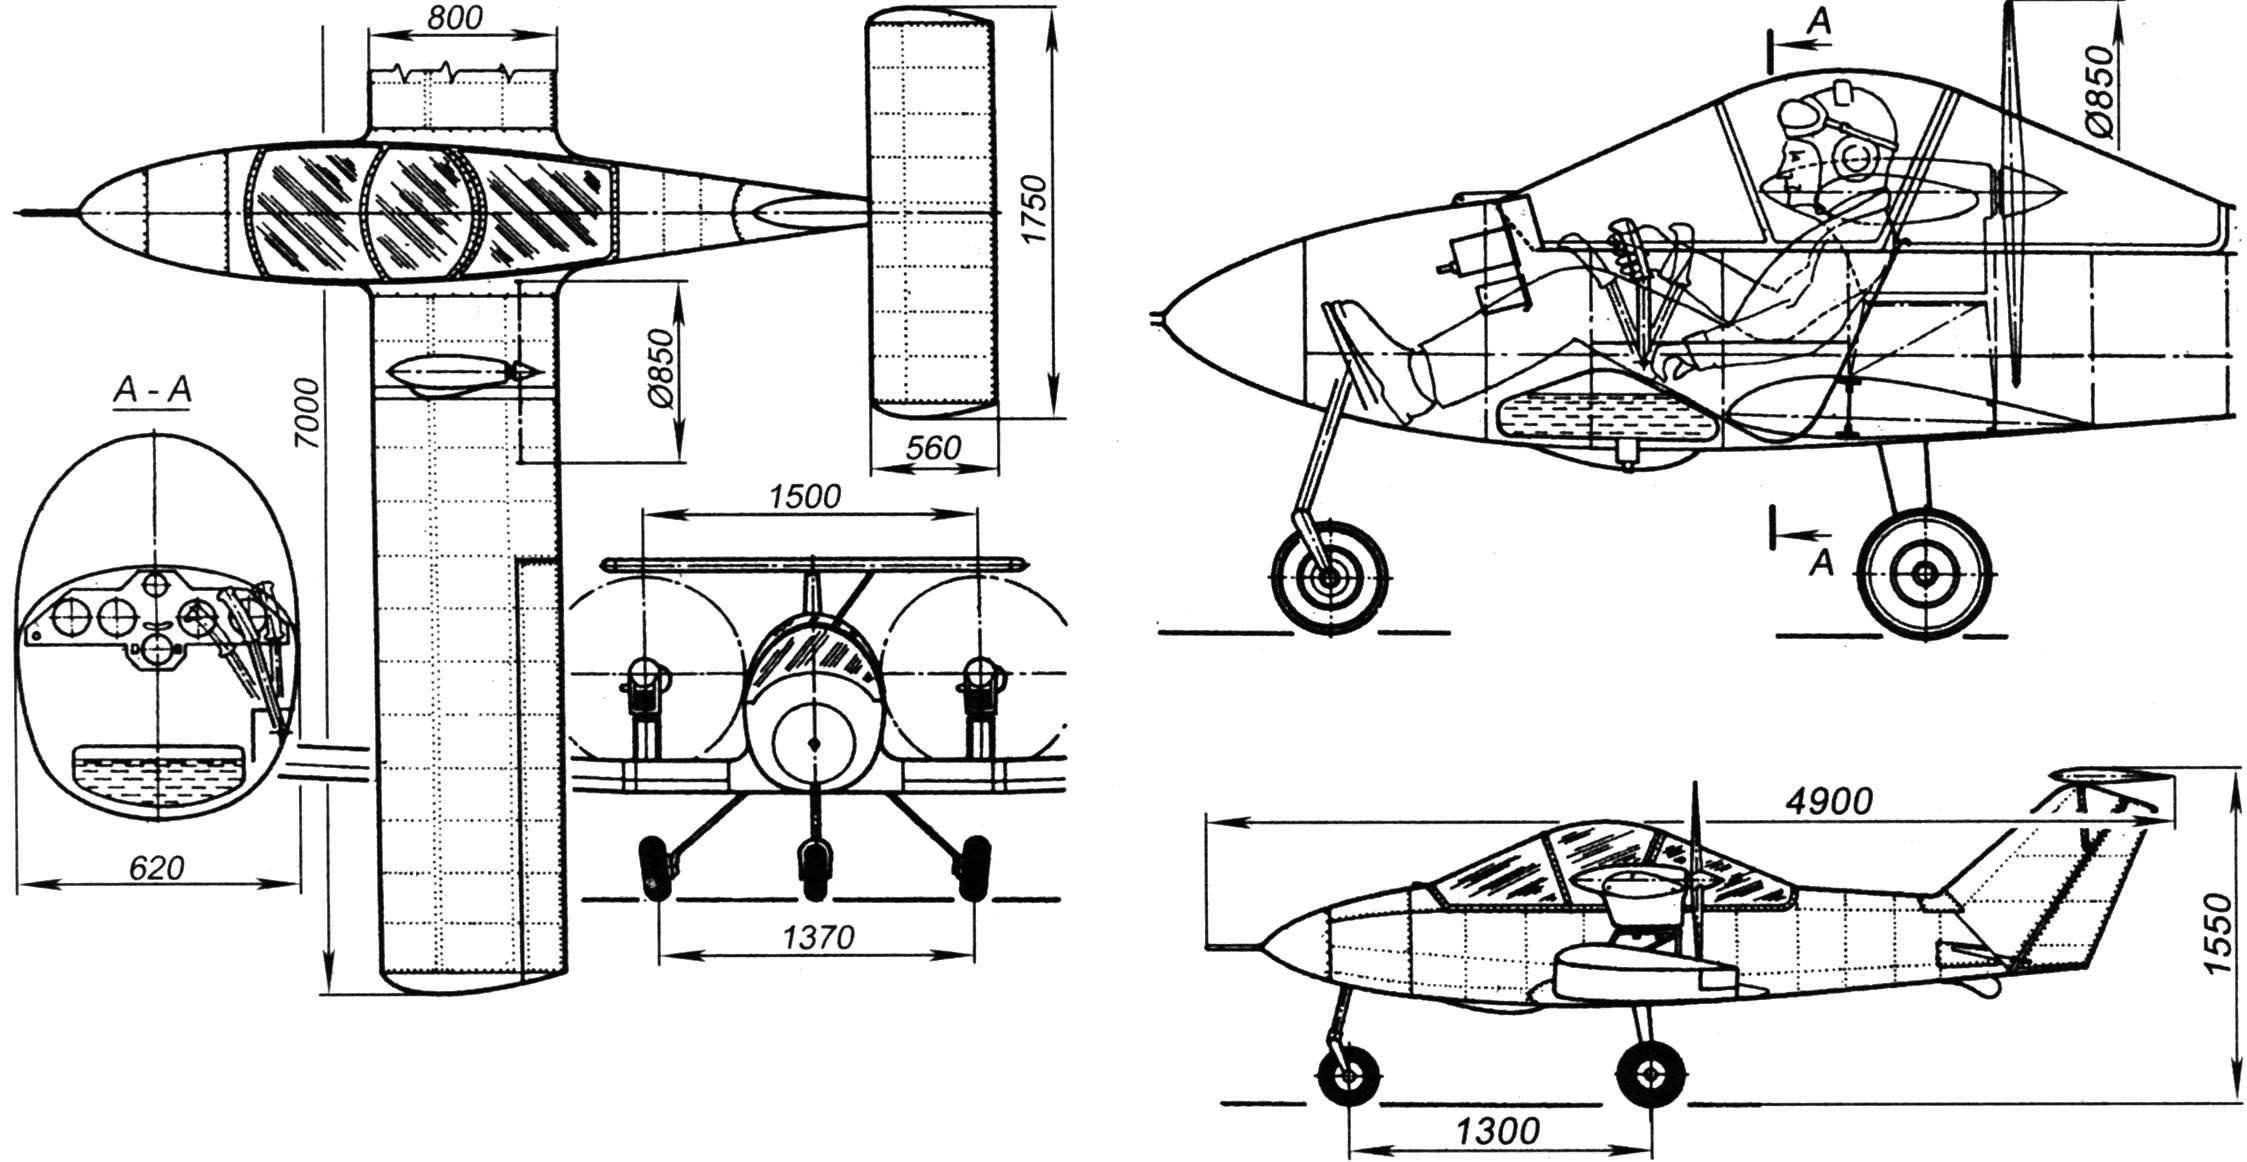 Самолёт «Феникс» М-5 конструкции Н. Мастерова (г. Самара)